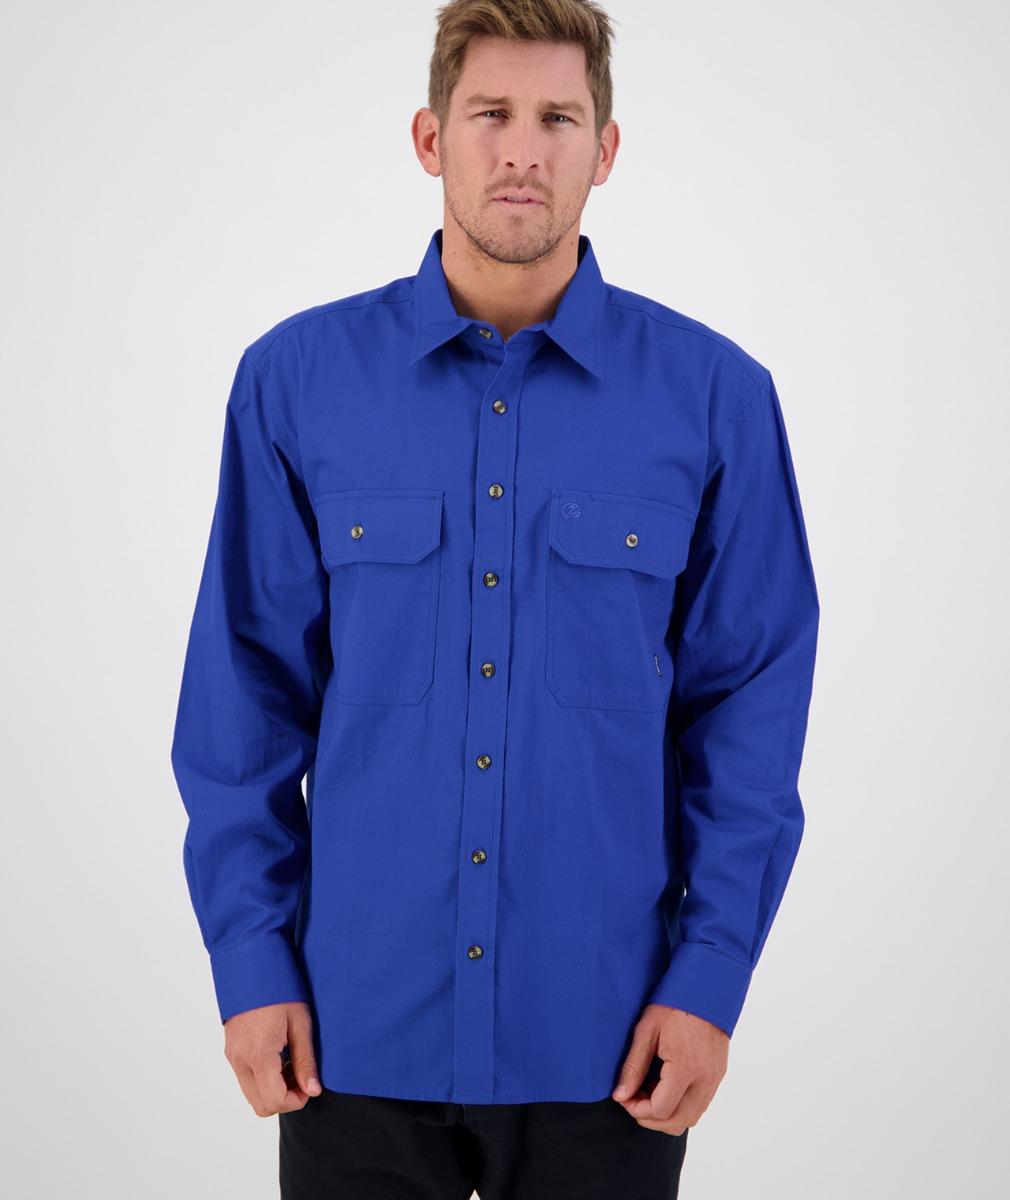 Swanndri Men's Byron Cotton Long Sleeve Shirt in Electric Blue